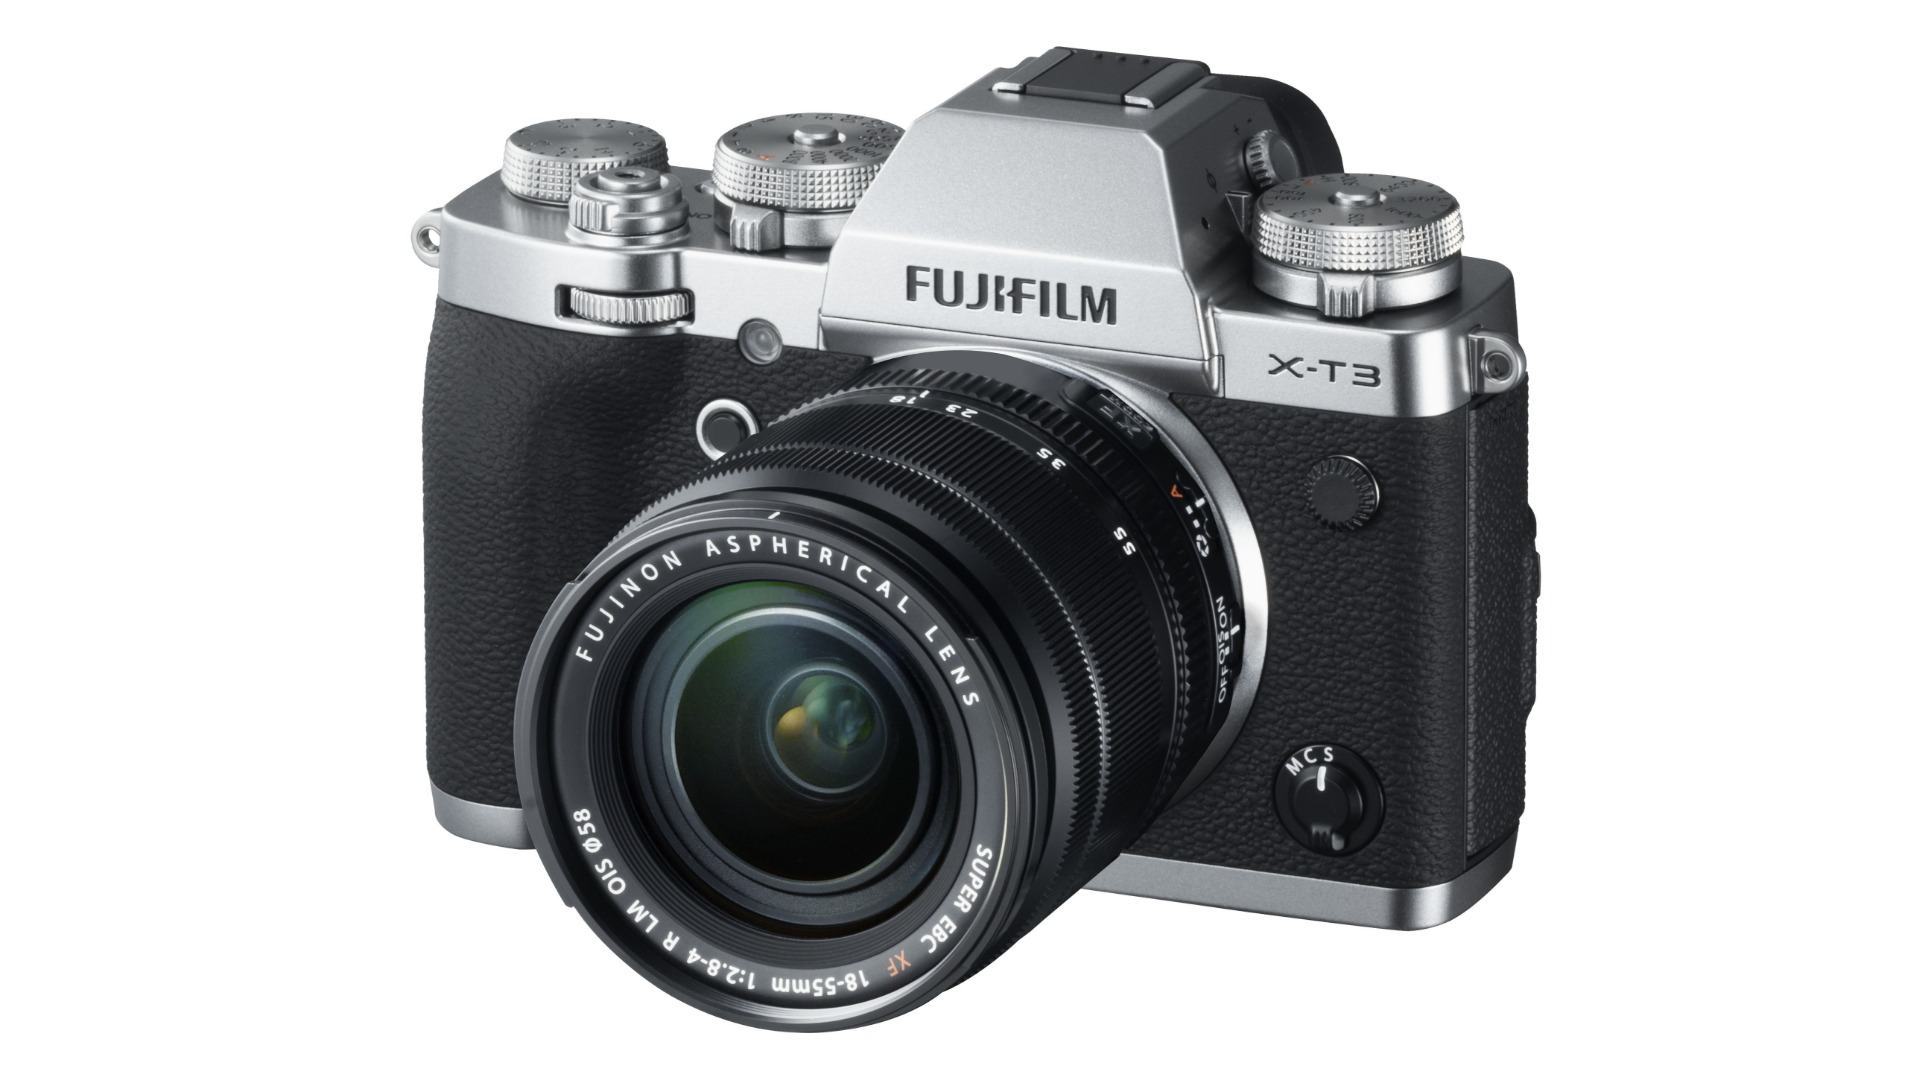 Fujifilm debuts 4th gen sensor and image processor in X-T3 mirrorless camera